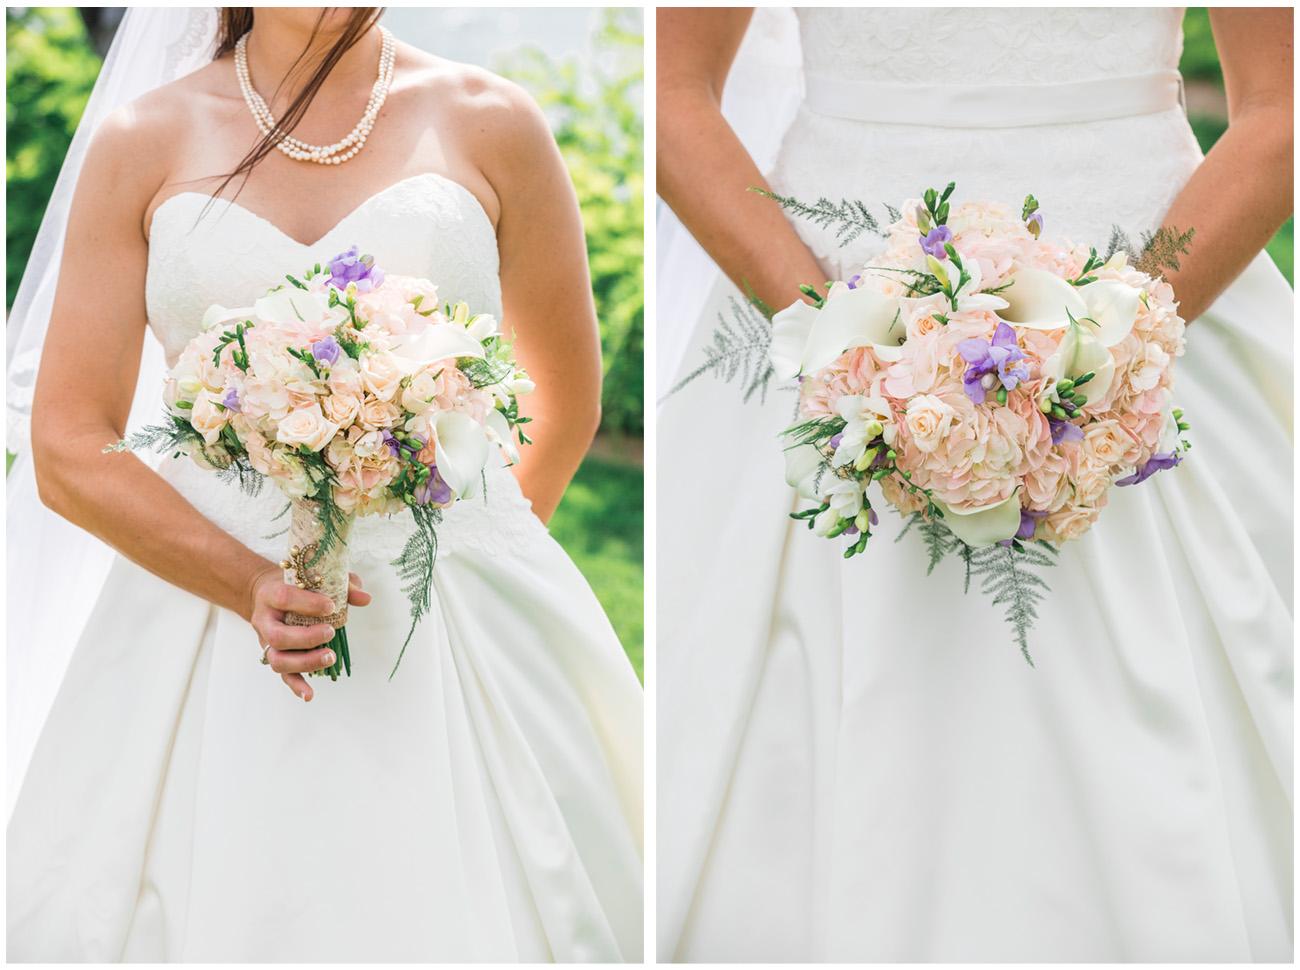 wedding bouquet of flowers held by bride